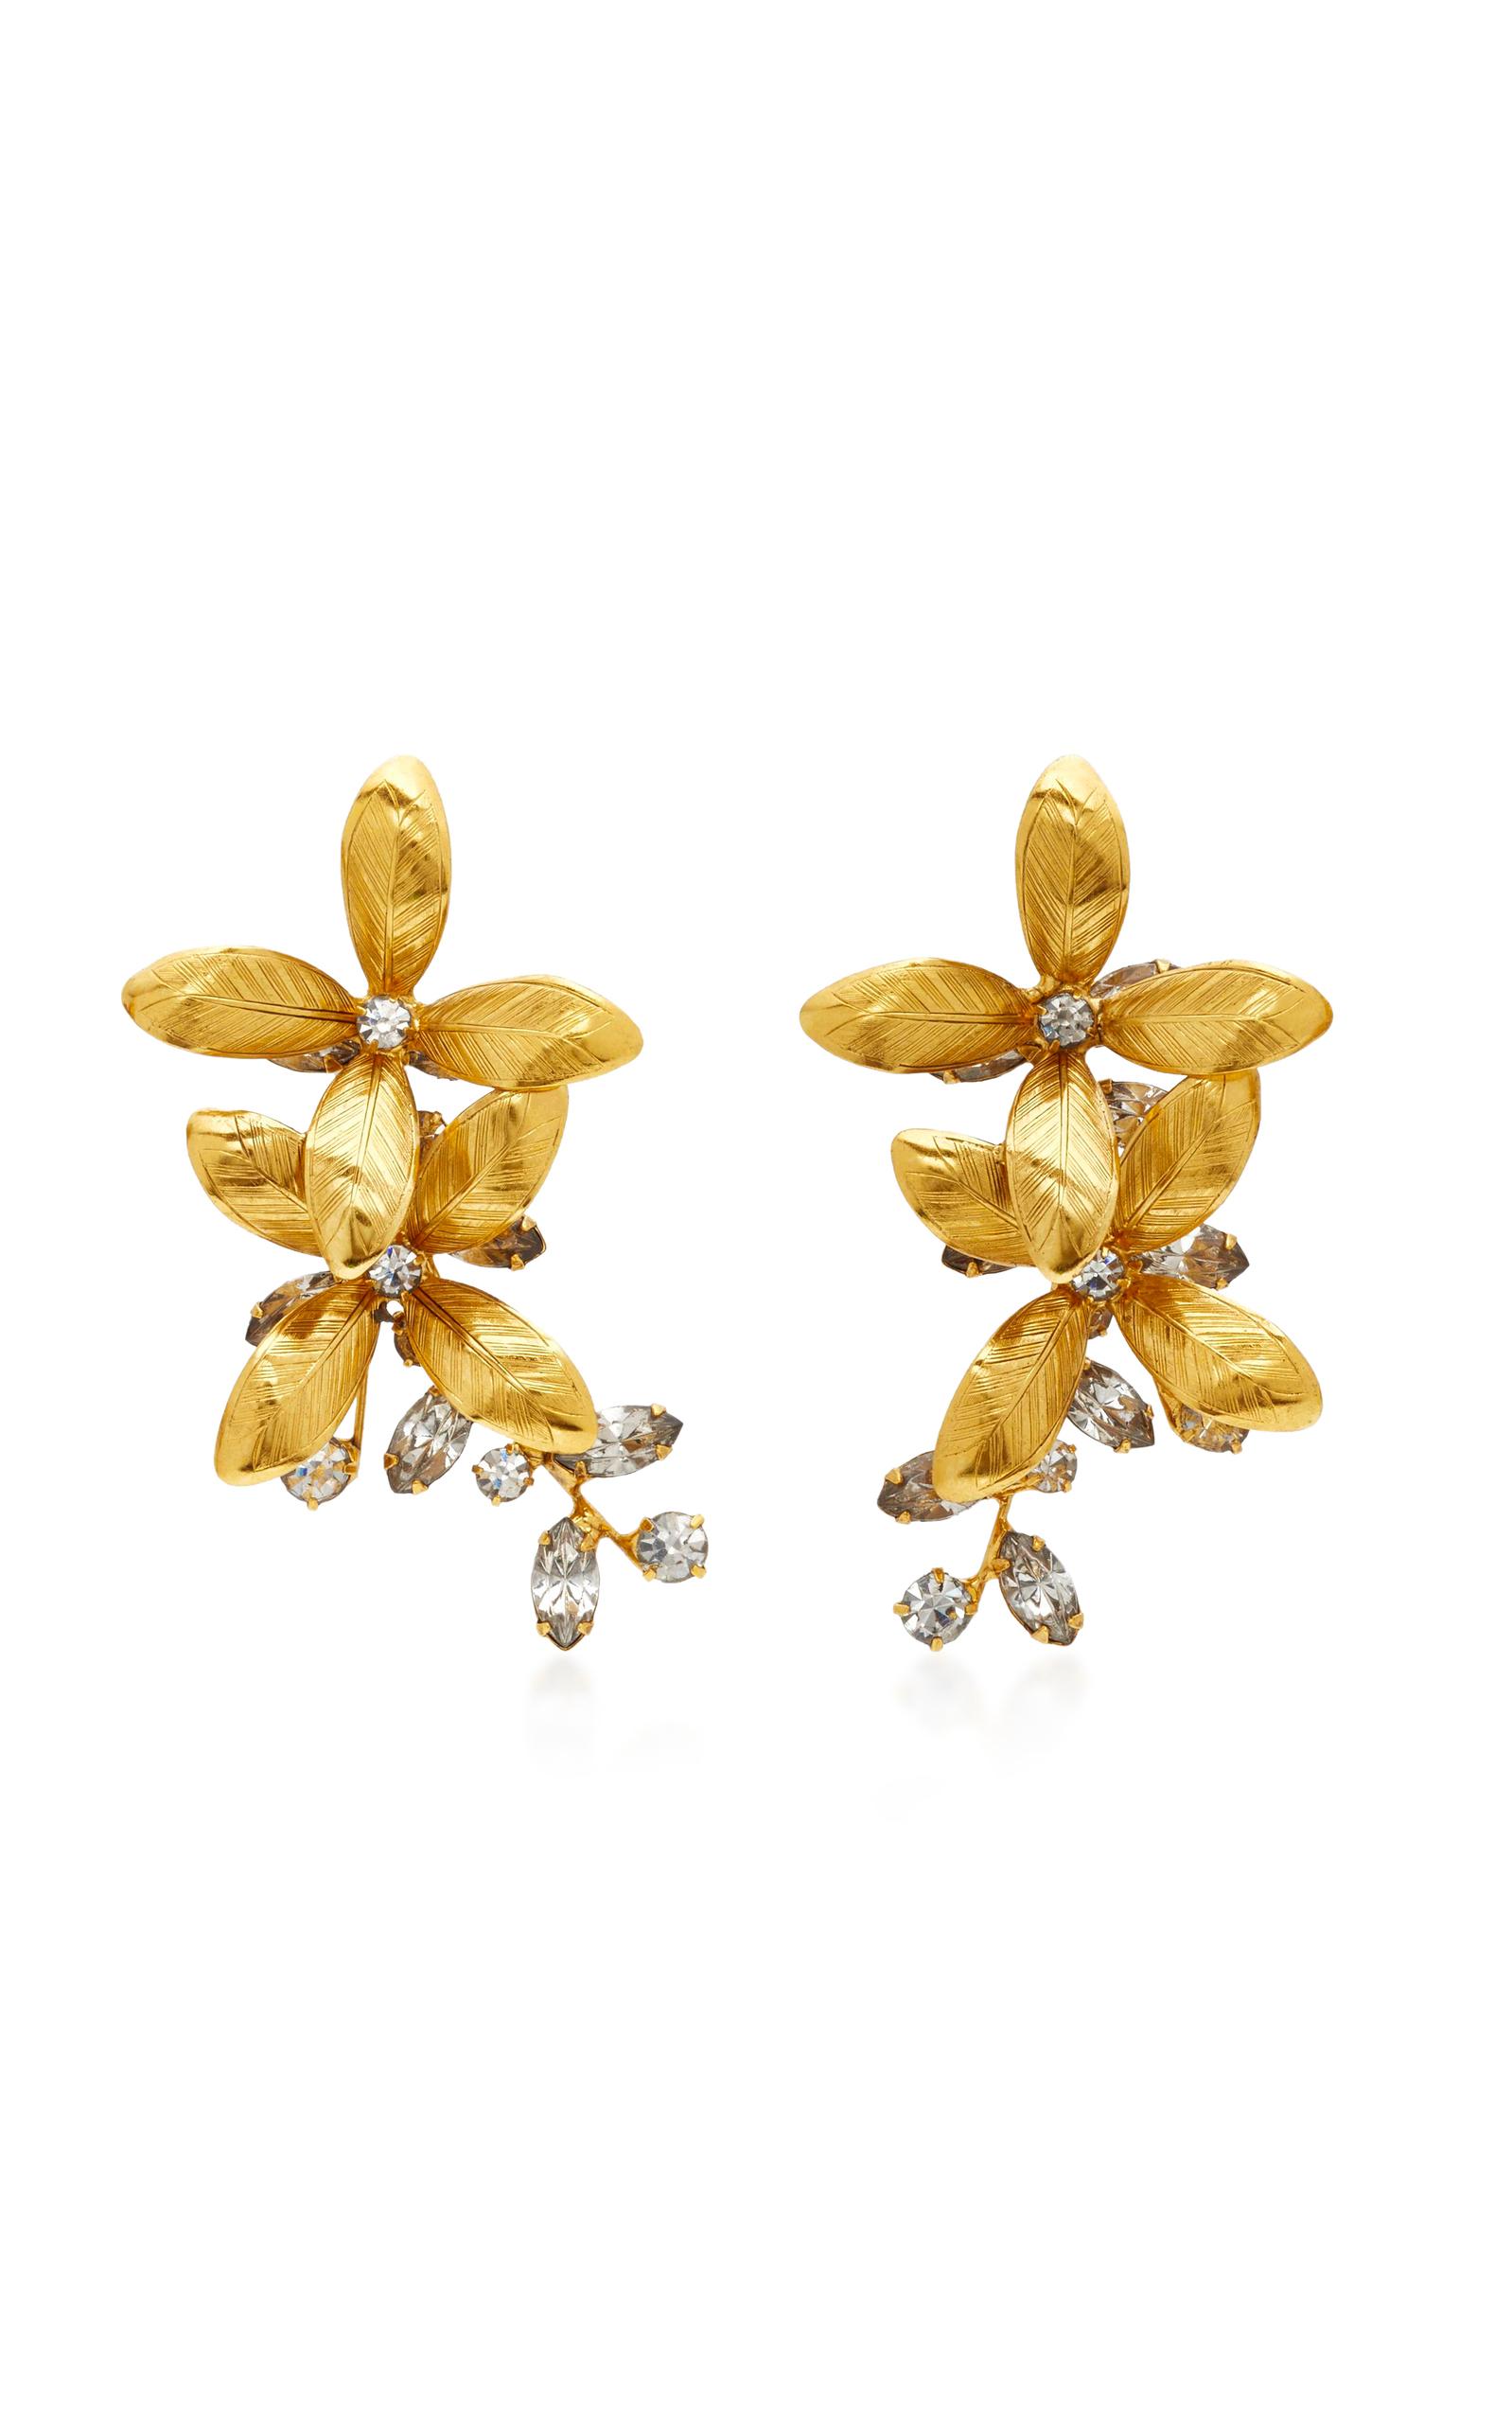 large_jennifer-behr-pink-layla-gold-plated-brass-swarovski-crystal-earrings.jpg